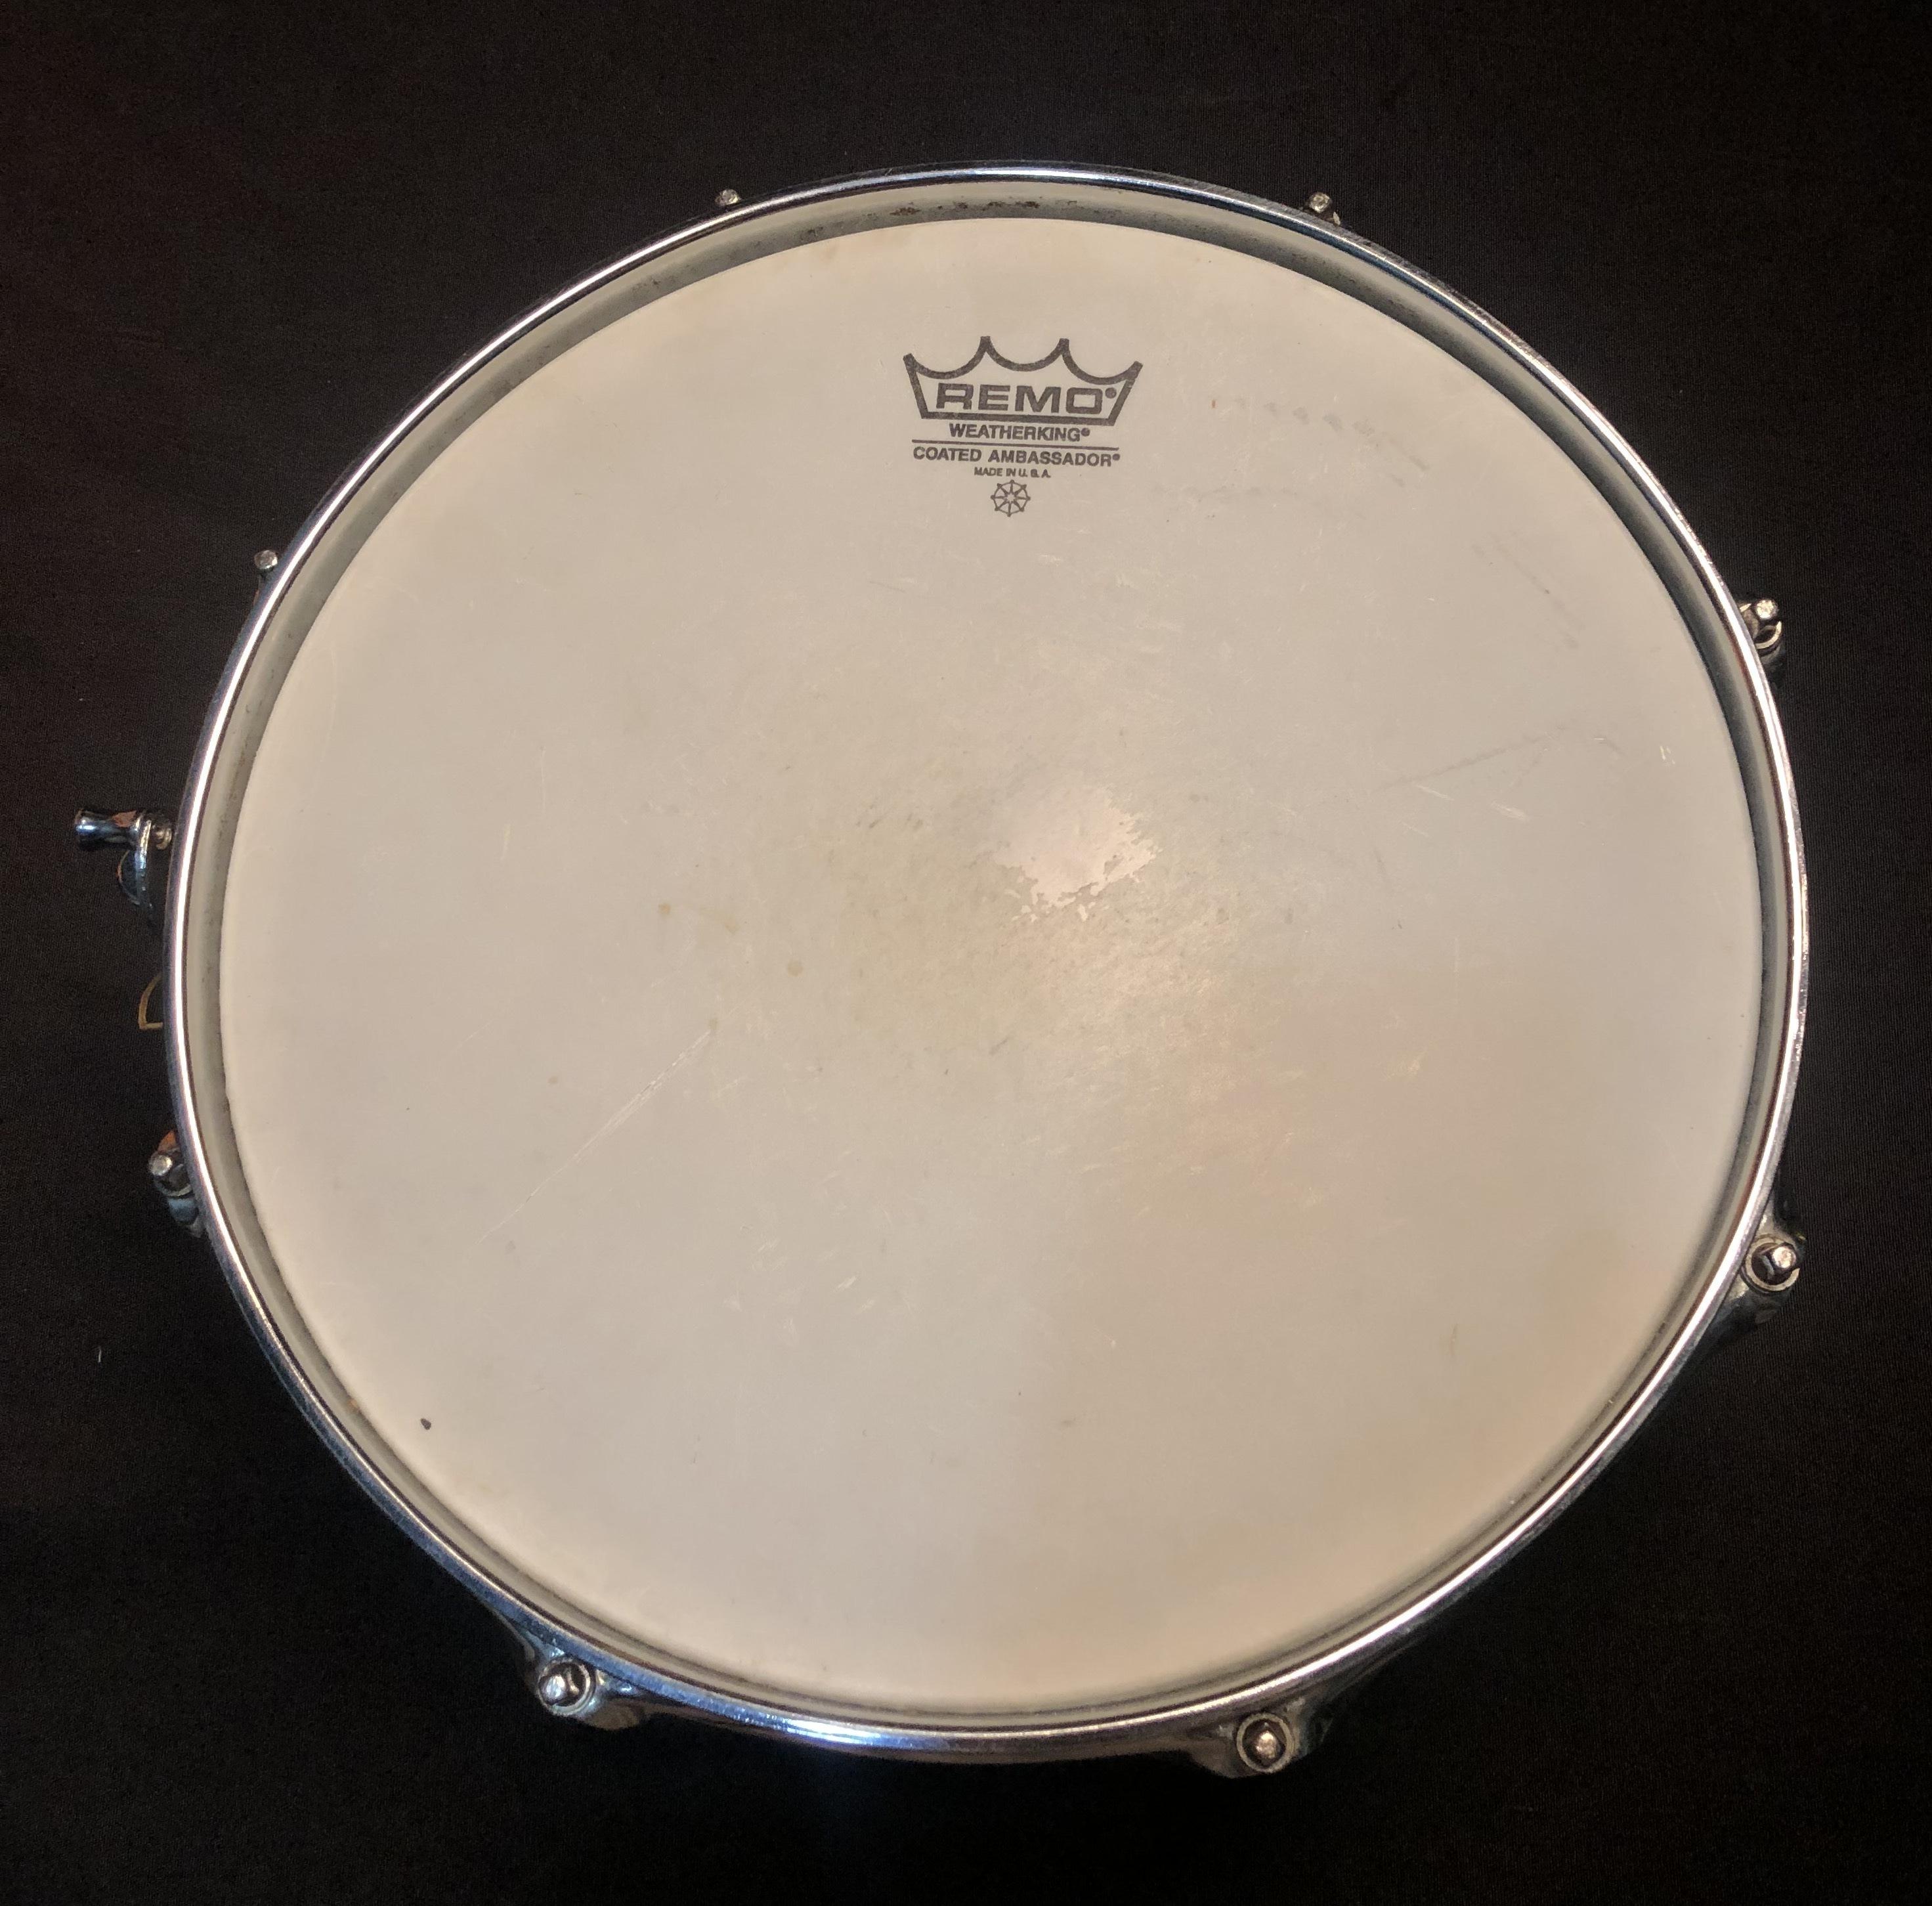 PEARL - Sensitone Steel Snare Drum 12